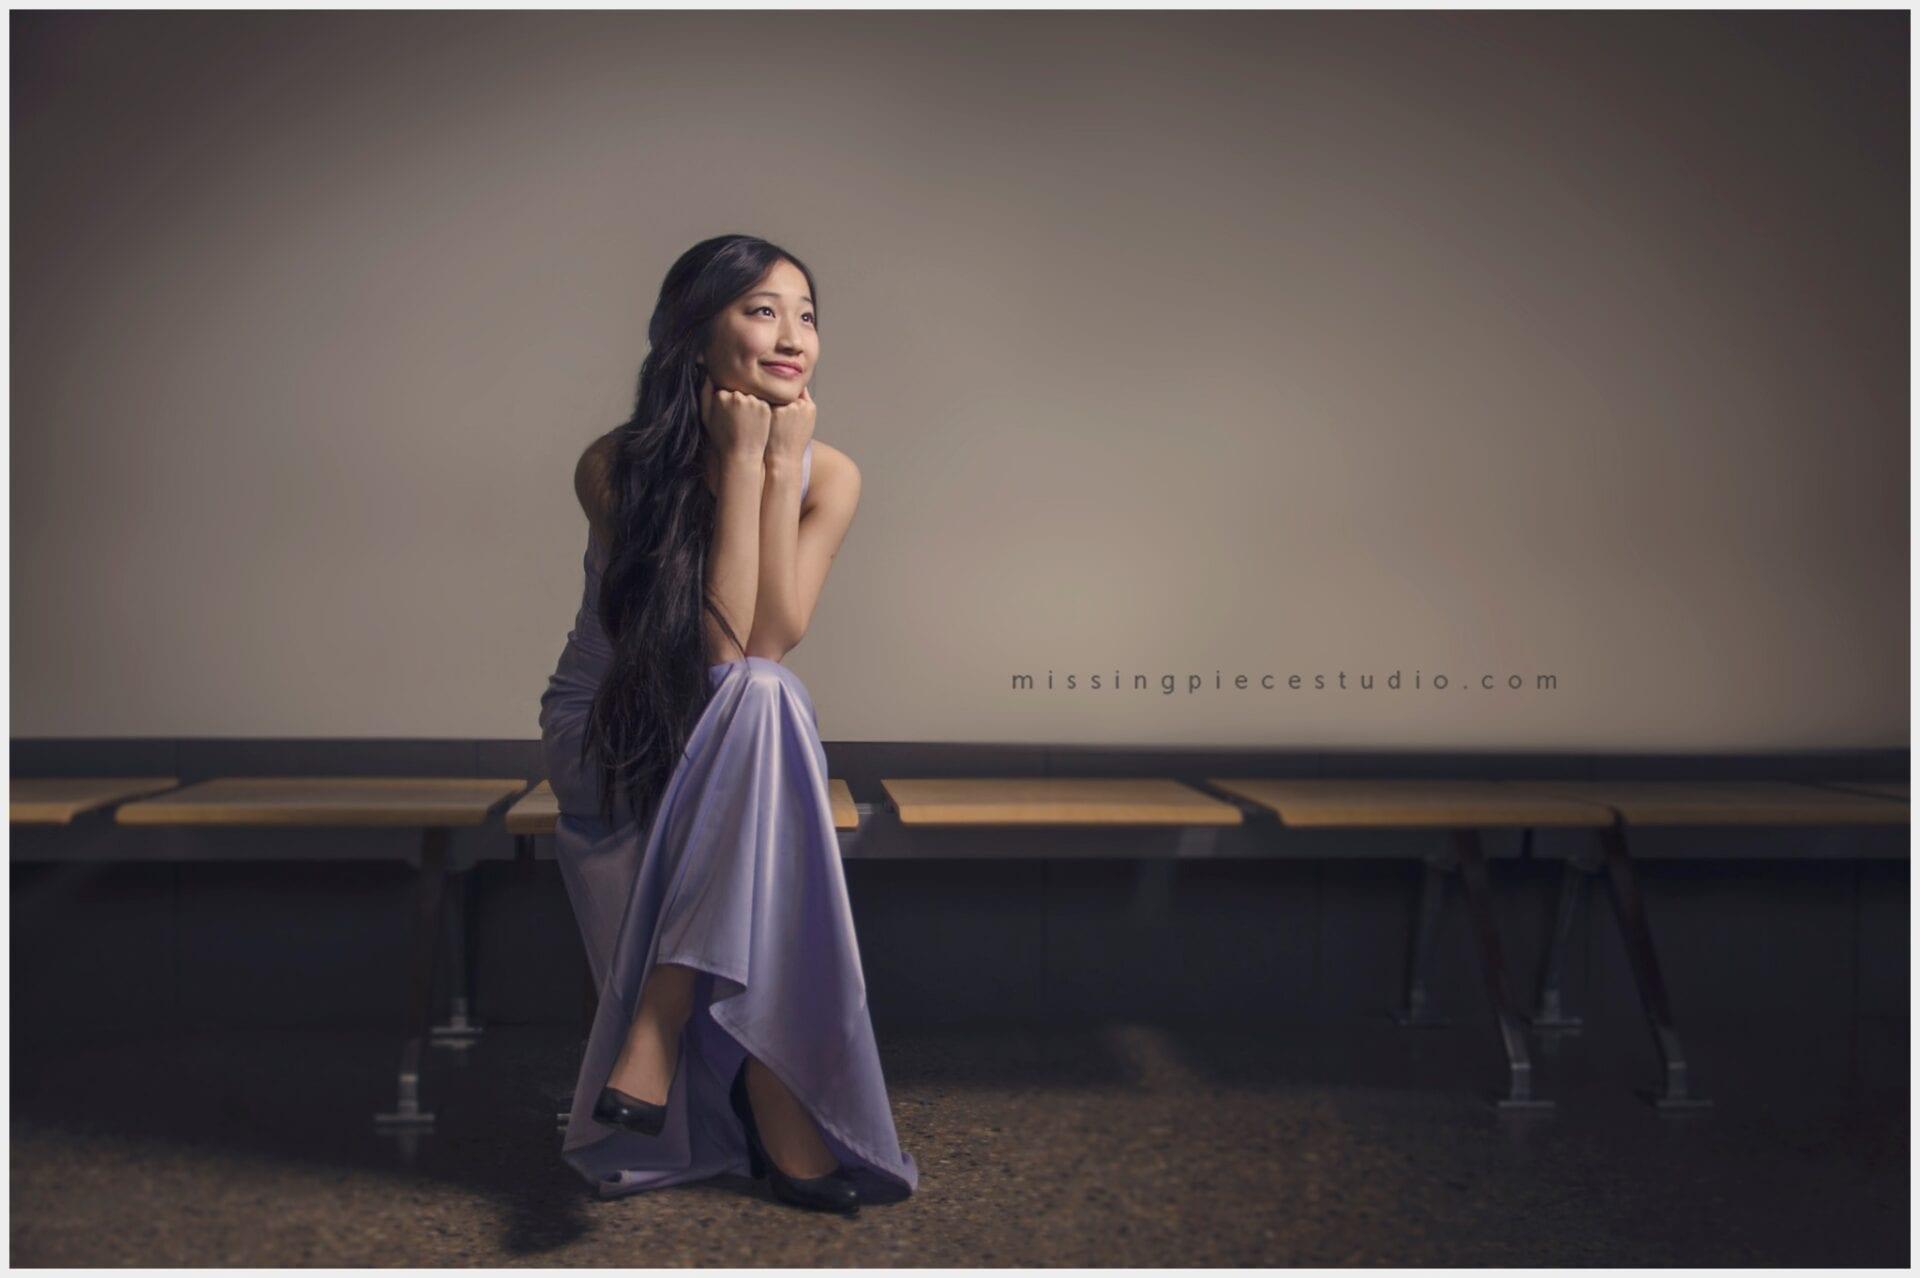 high school senior graduation photographer from Edmonton and Calgary